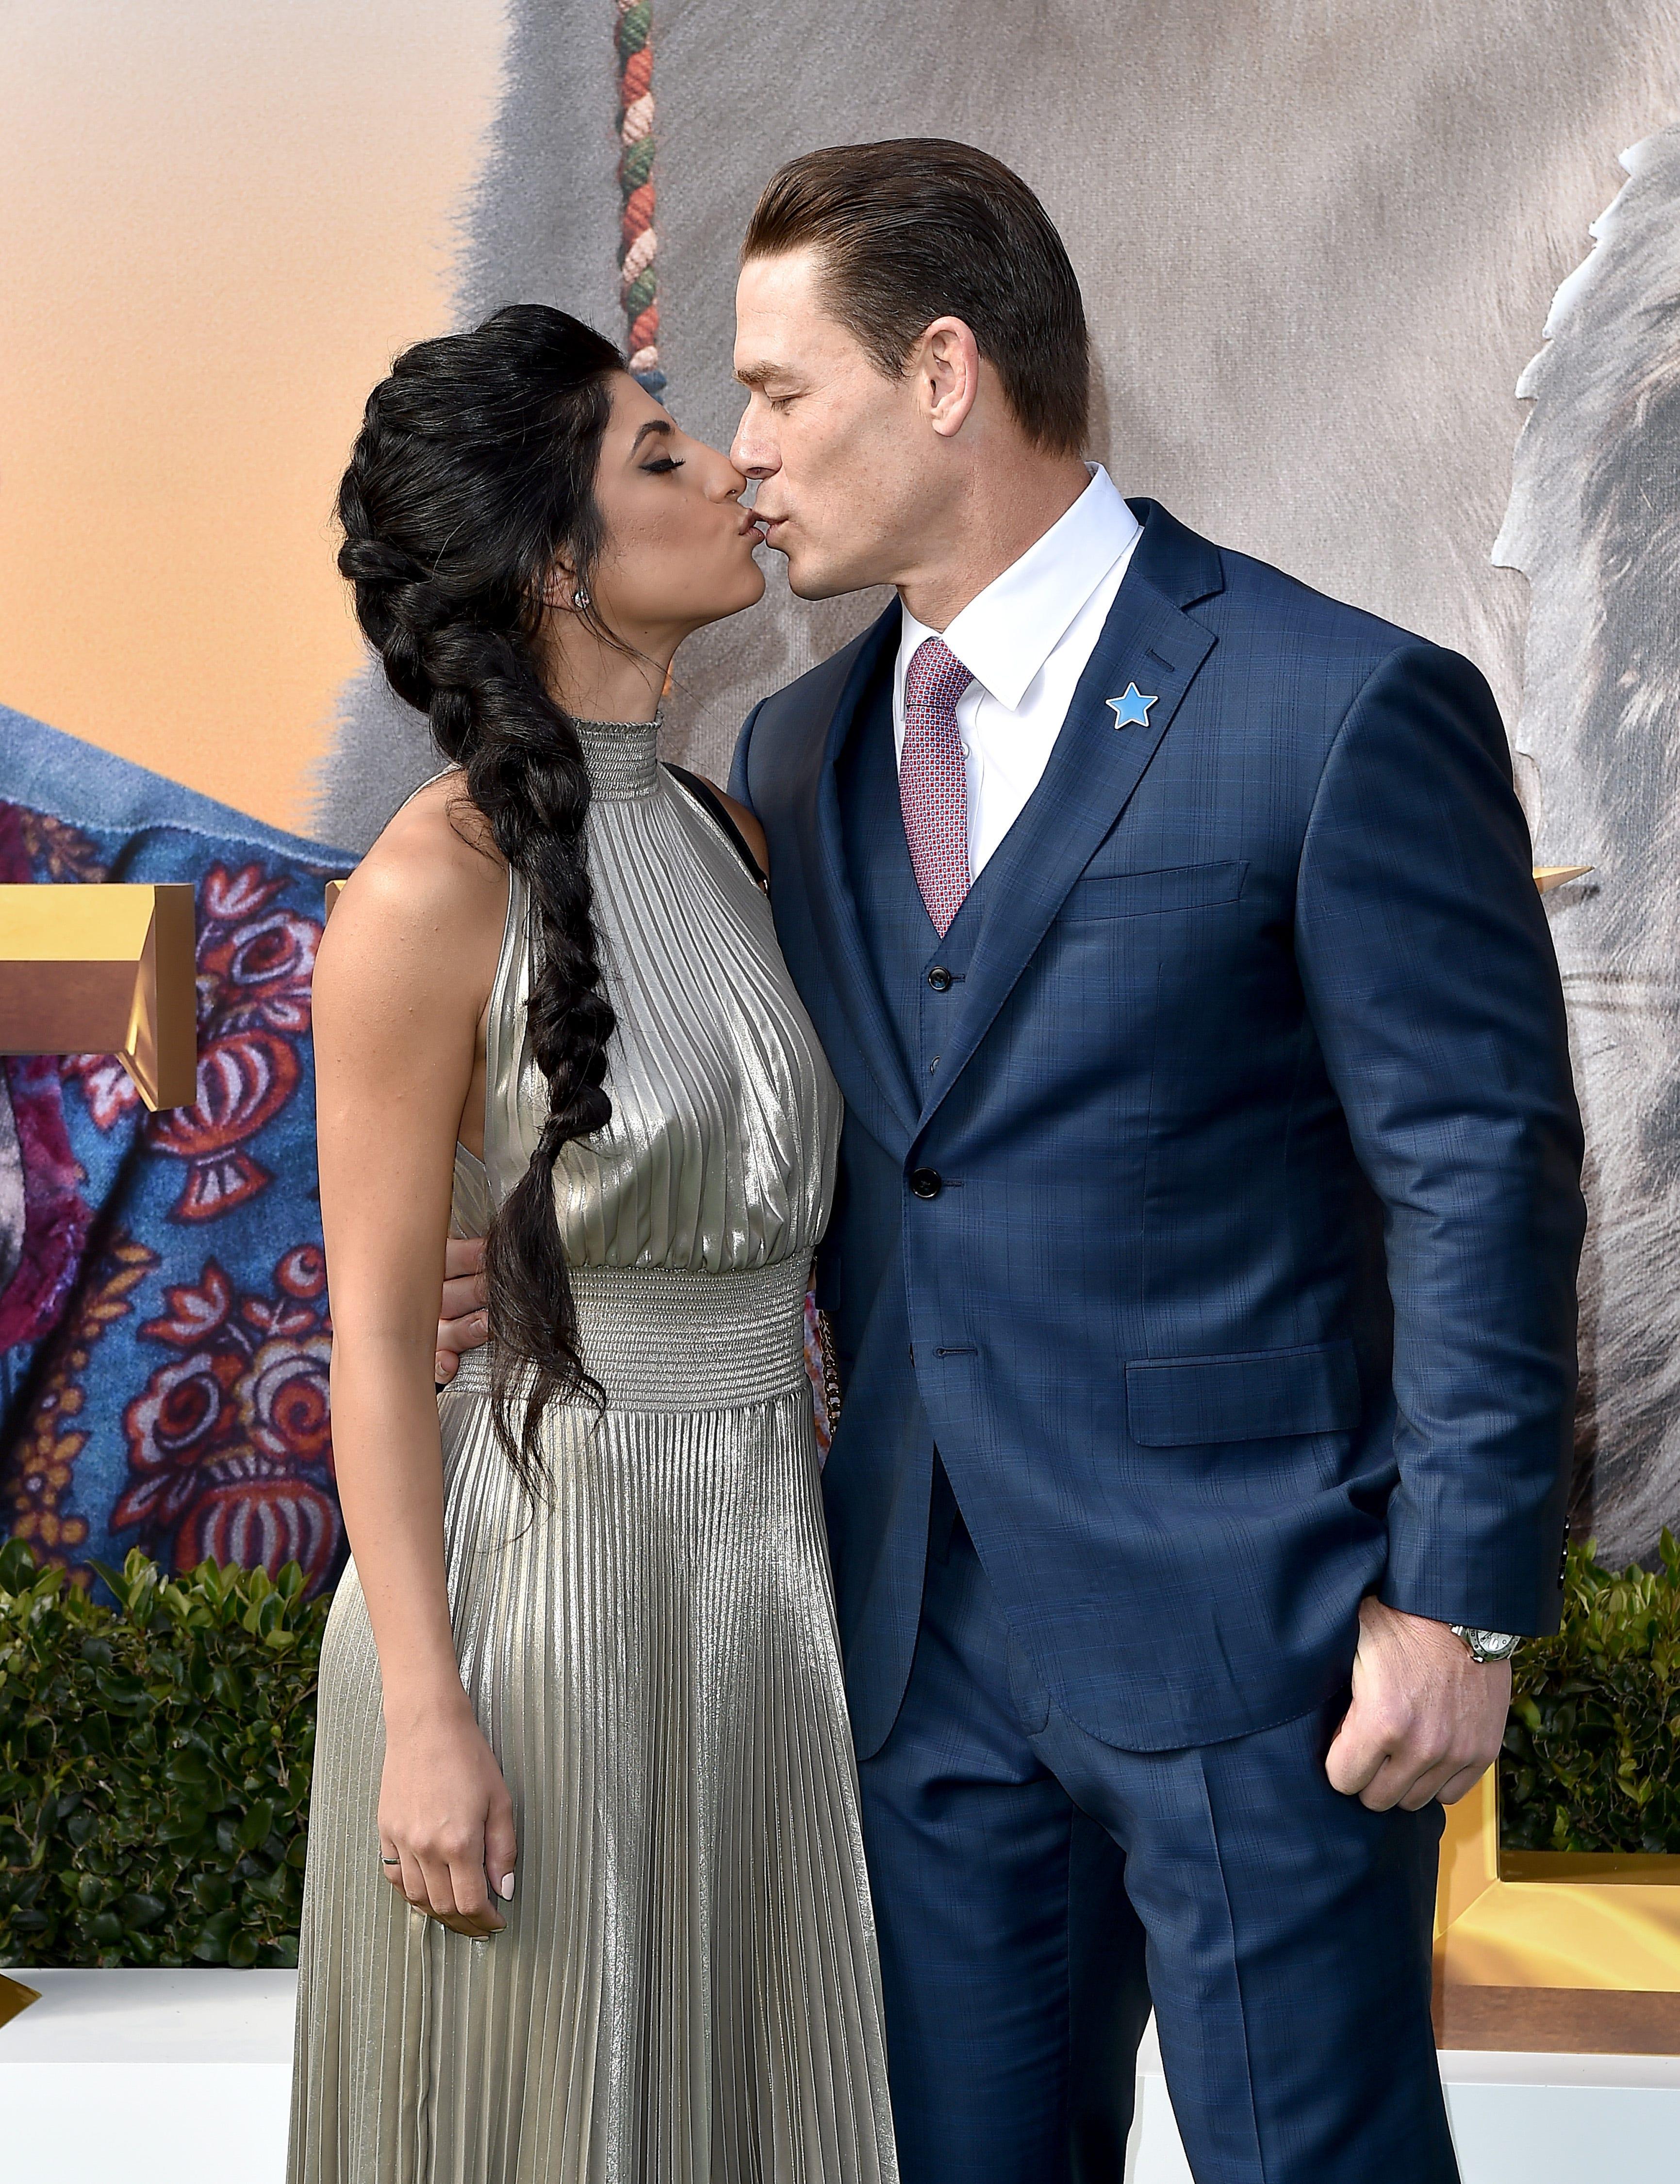 John Cena Reportedly Weds Shay Shariatzadeh In Quiet Florida Ceremony John cena with his wife. usa today